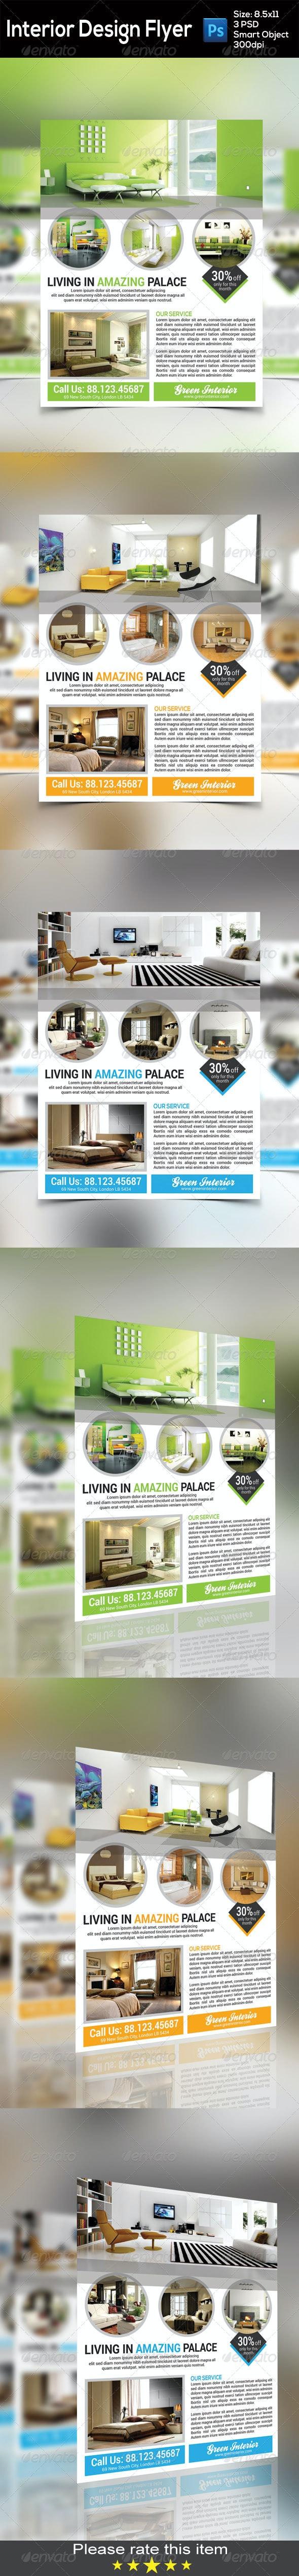 Interior Flyer - Commerce Flyers